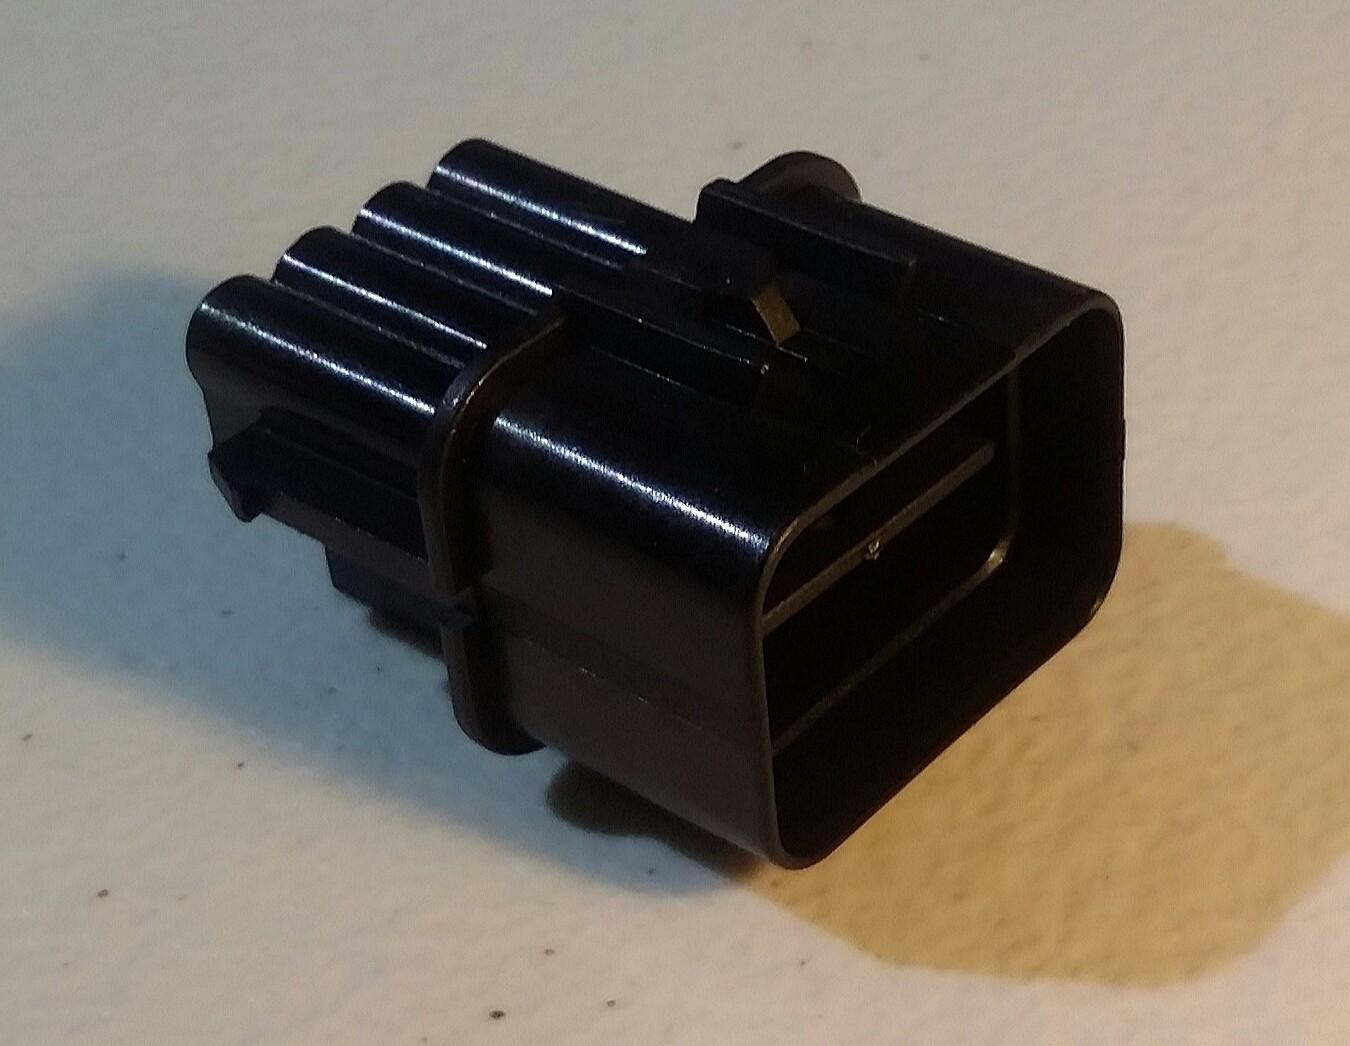 Headlight Connector 8 pin EVO 7-9 (CT9A) Male